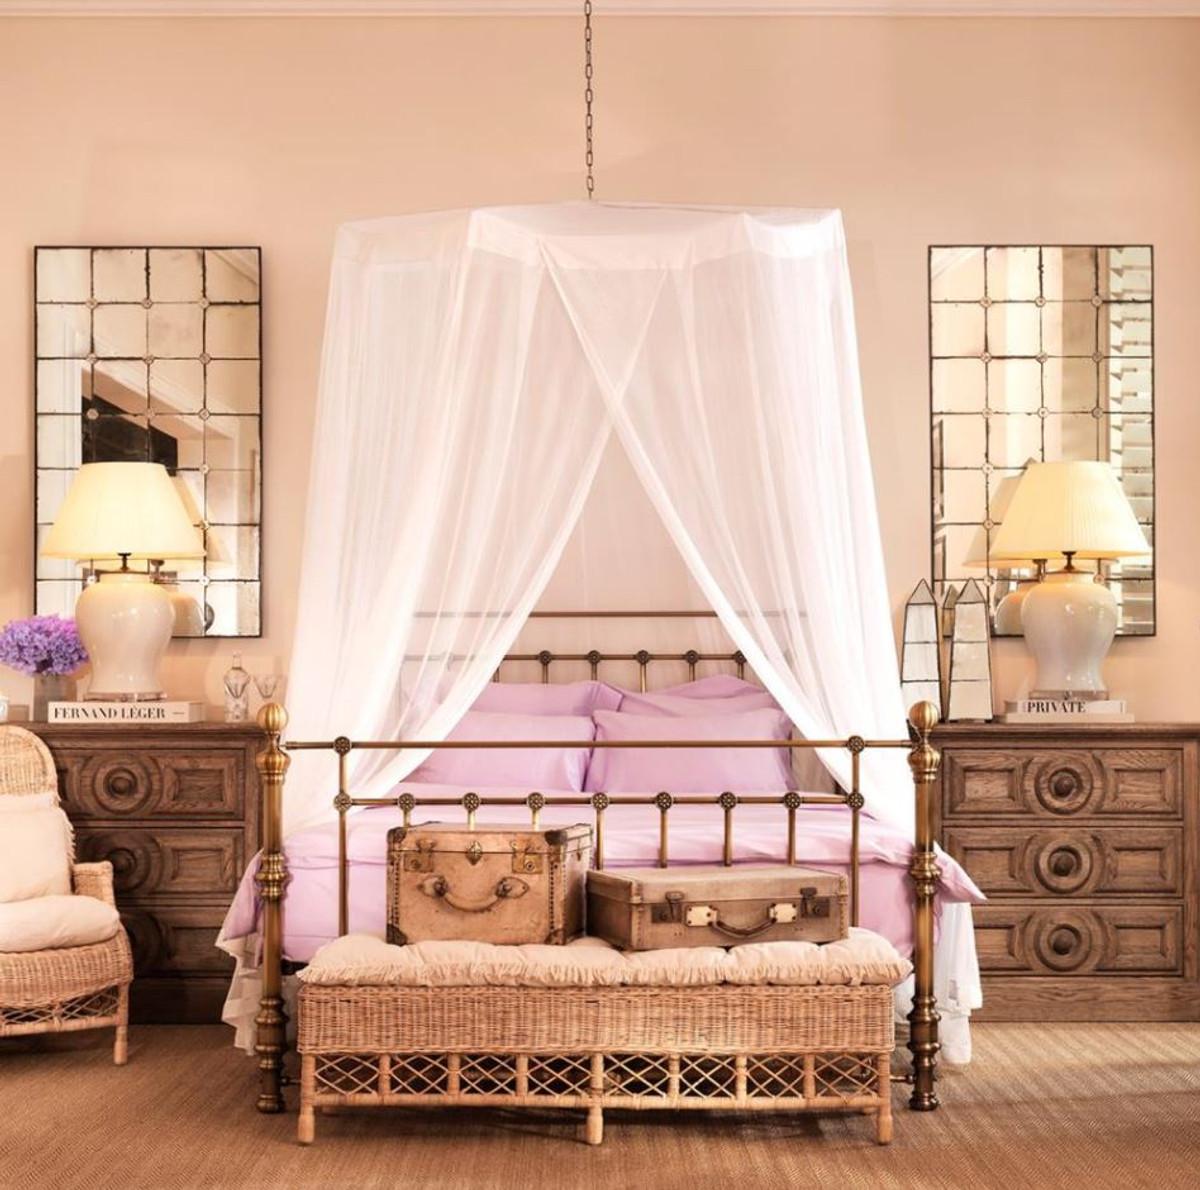 Casa Padrino Luxus Bett Antik Messing 187 x 225,5 x H. 152,5 cm - Designer Möbel 7